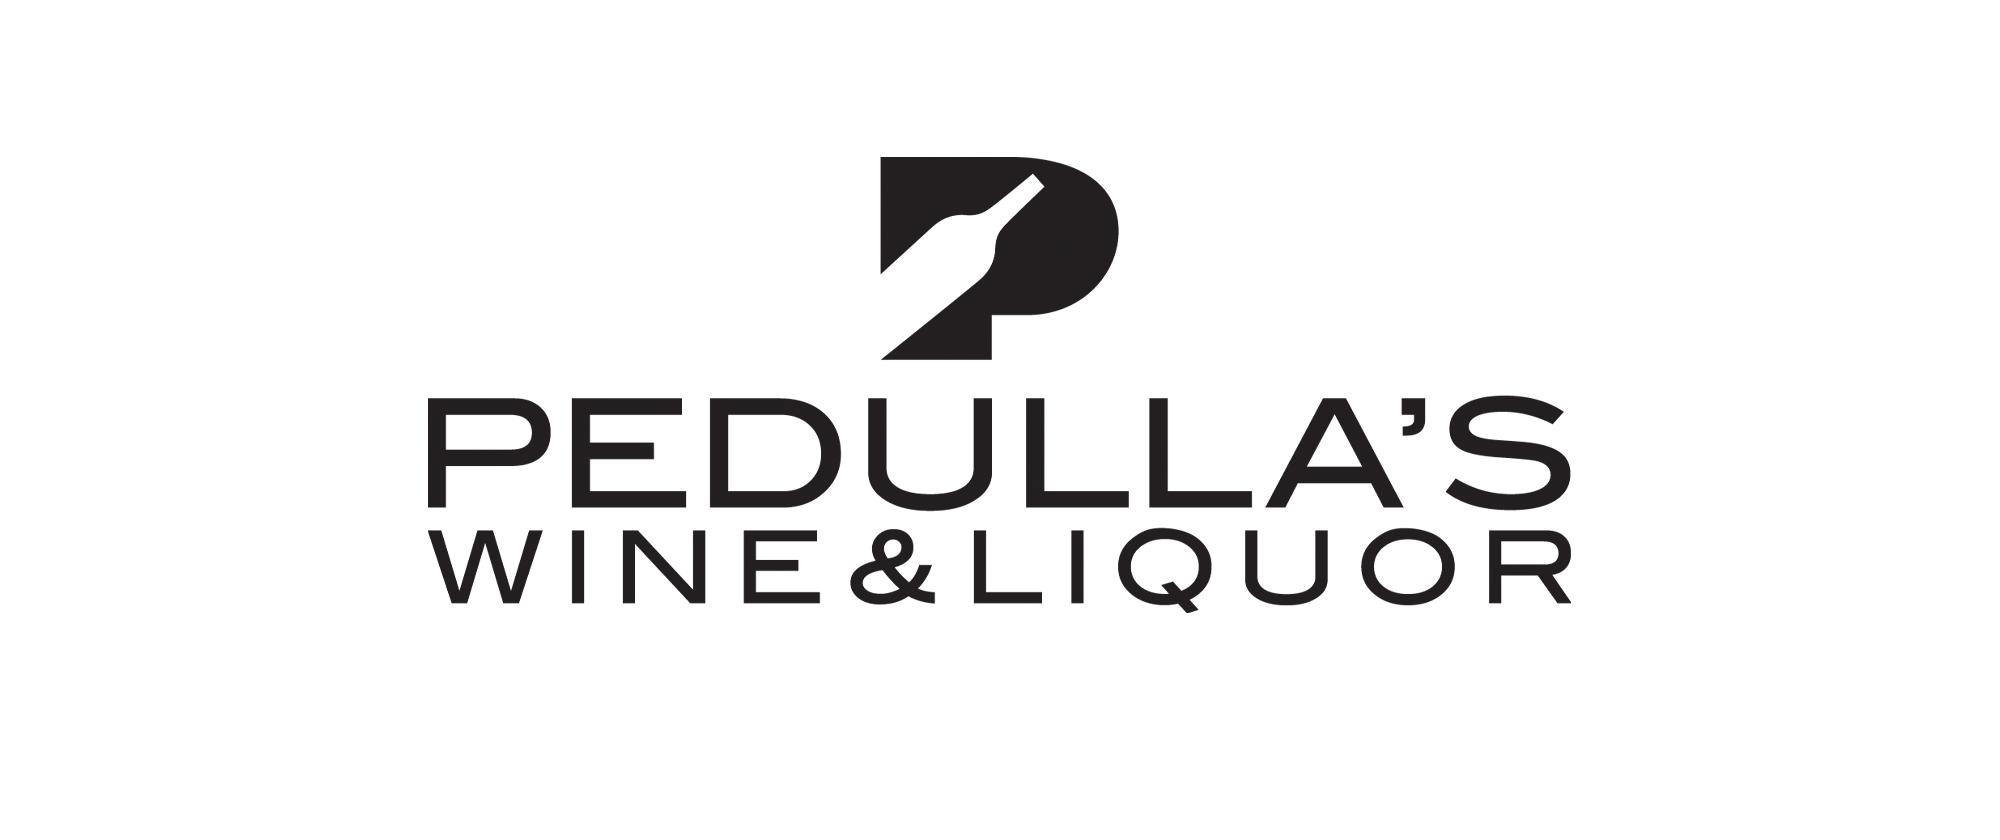 Pedullas Logo Vertical Black